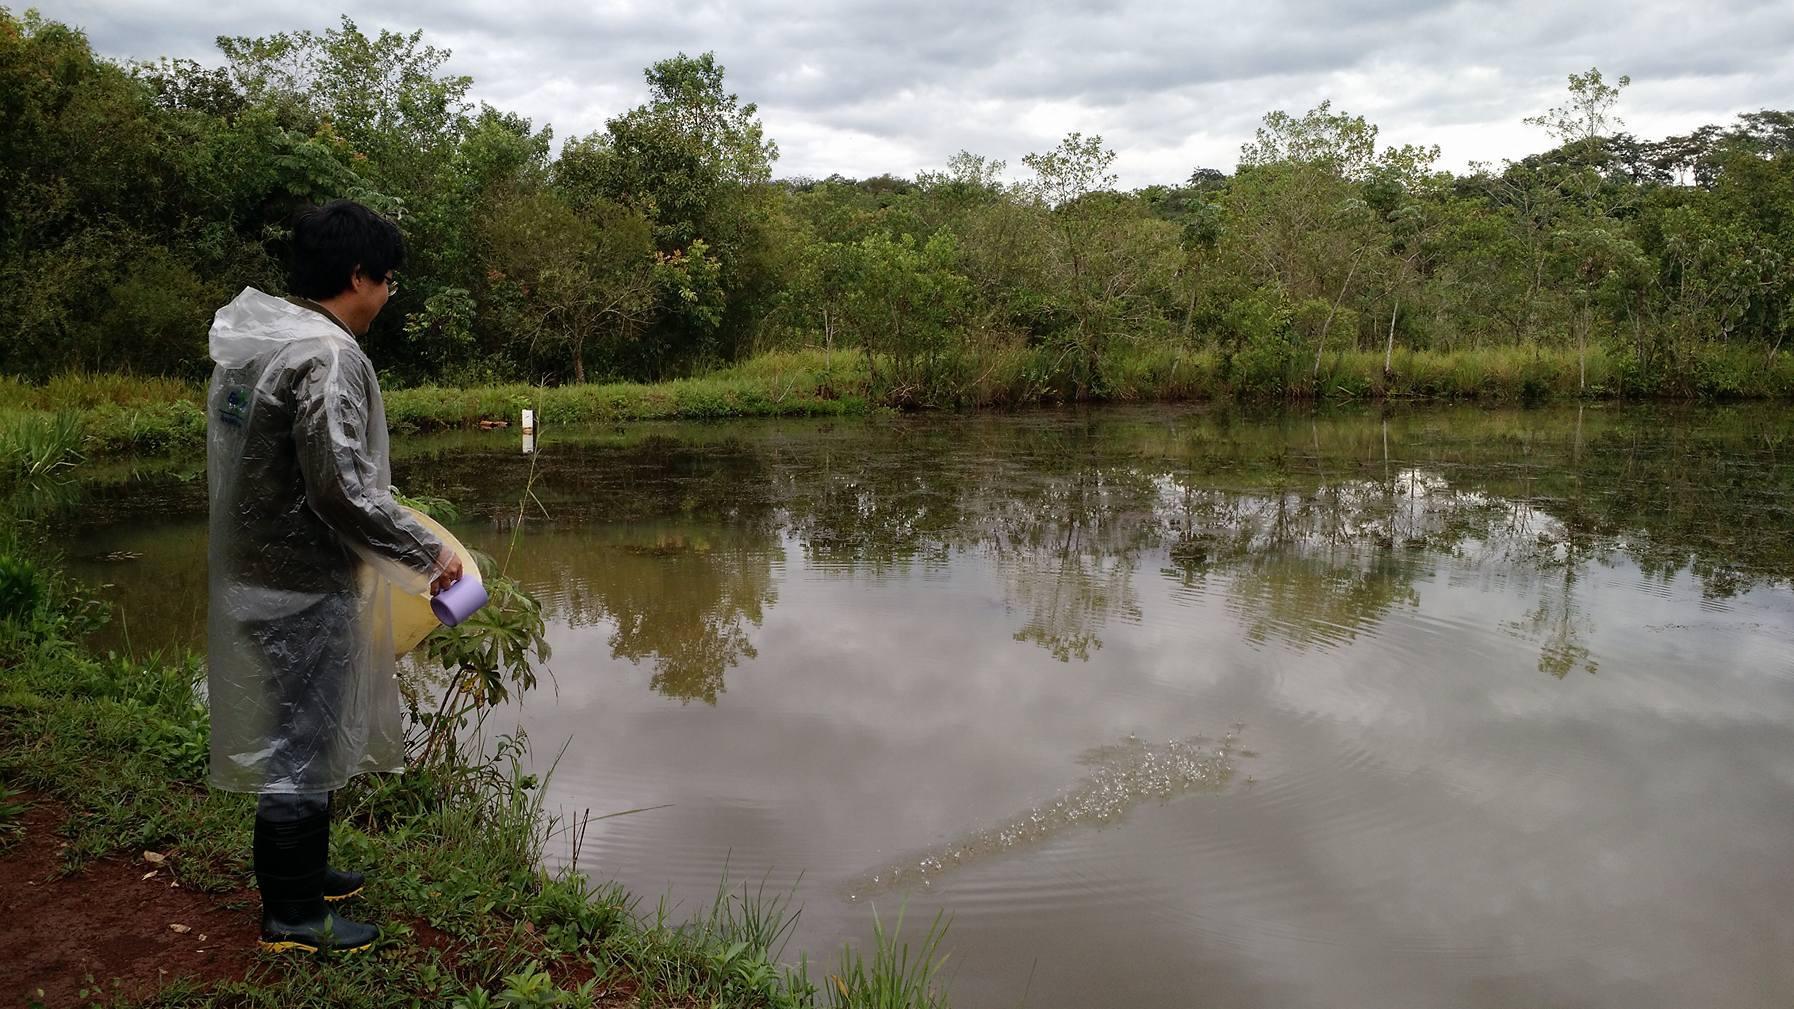 Piscicultura qualidade e temperatura da gua s o for Elaboracion de estanques para piscicultura